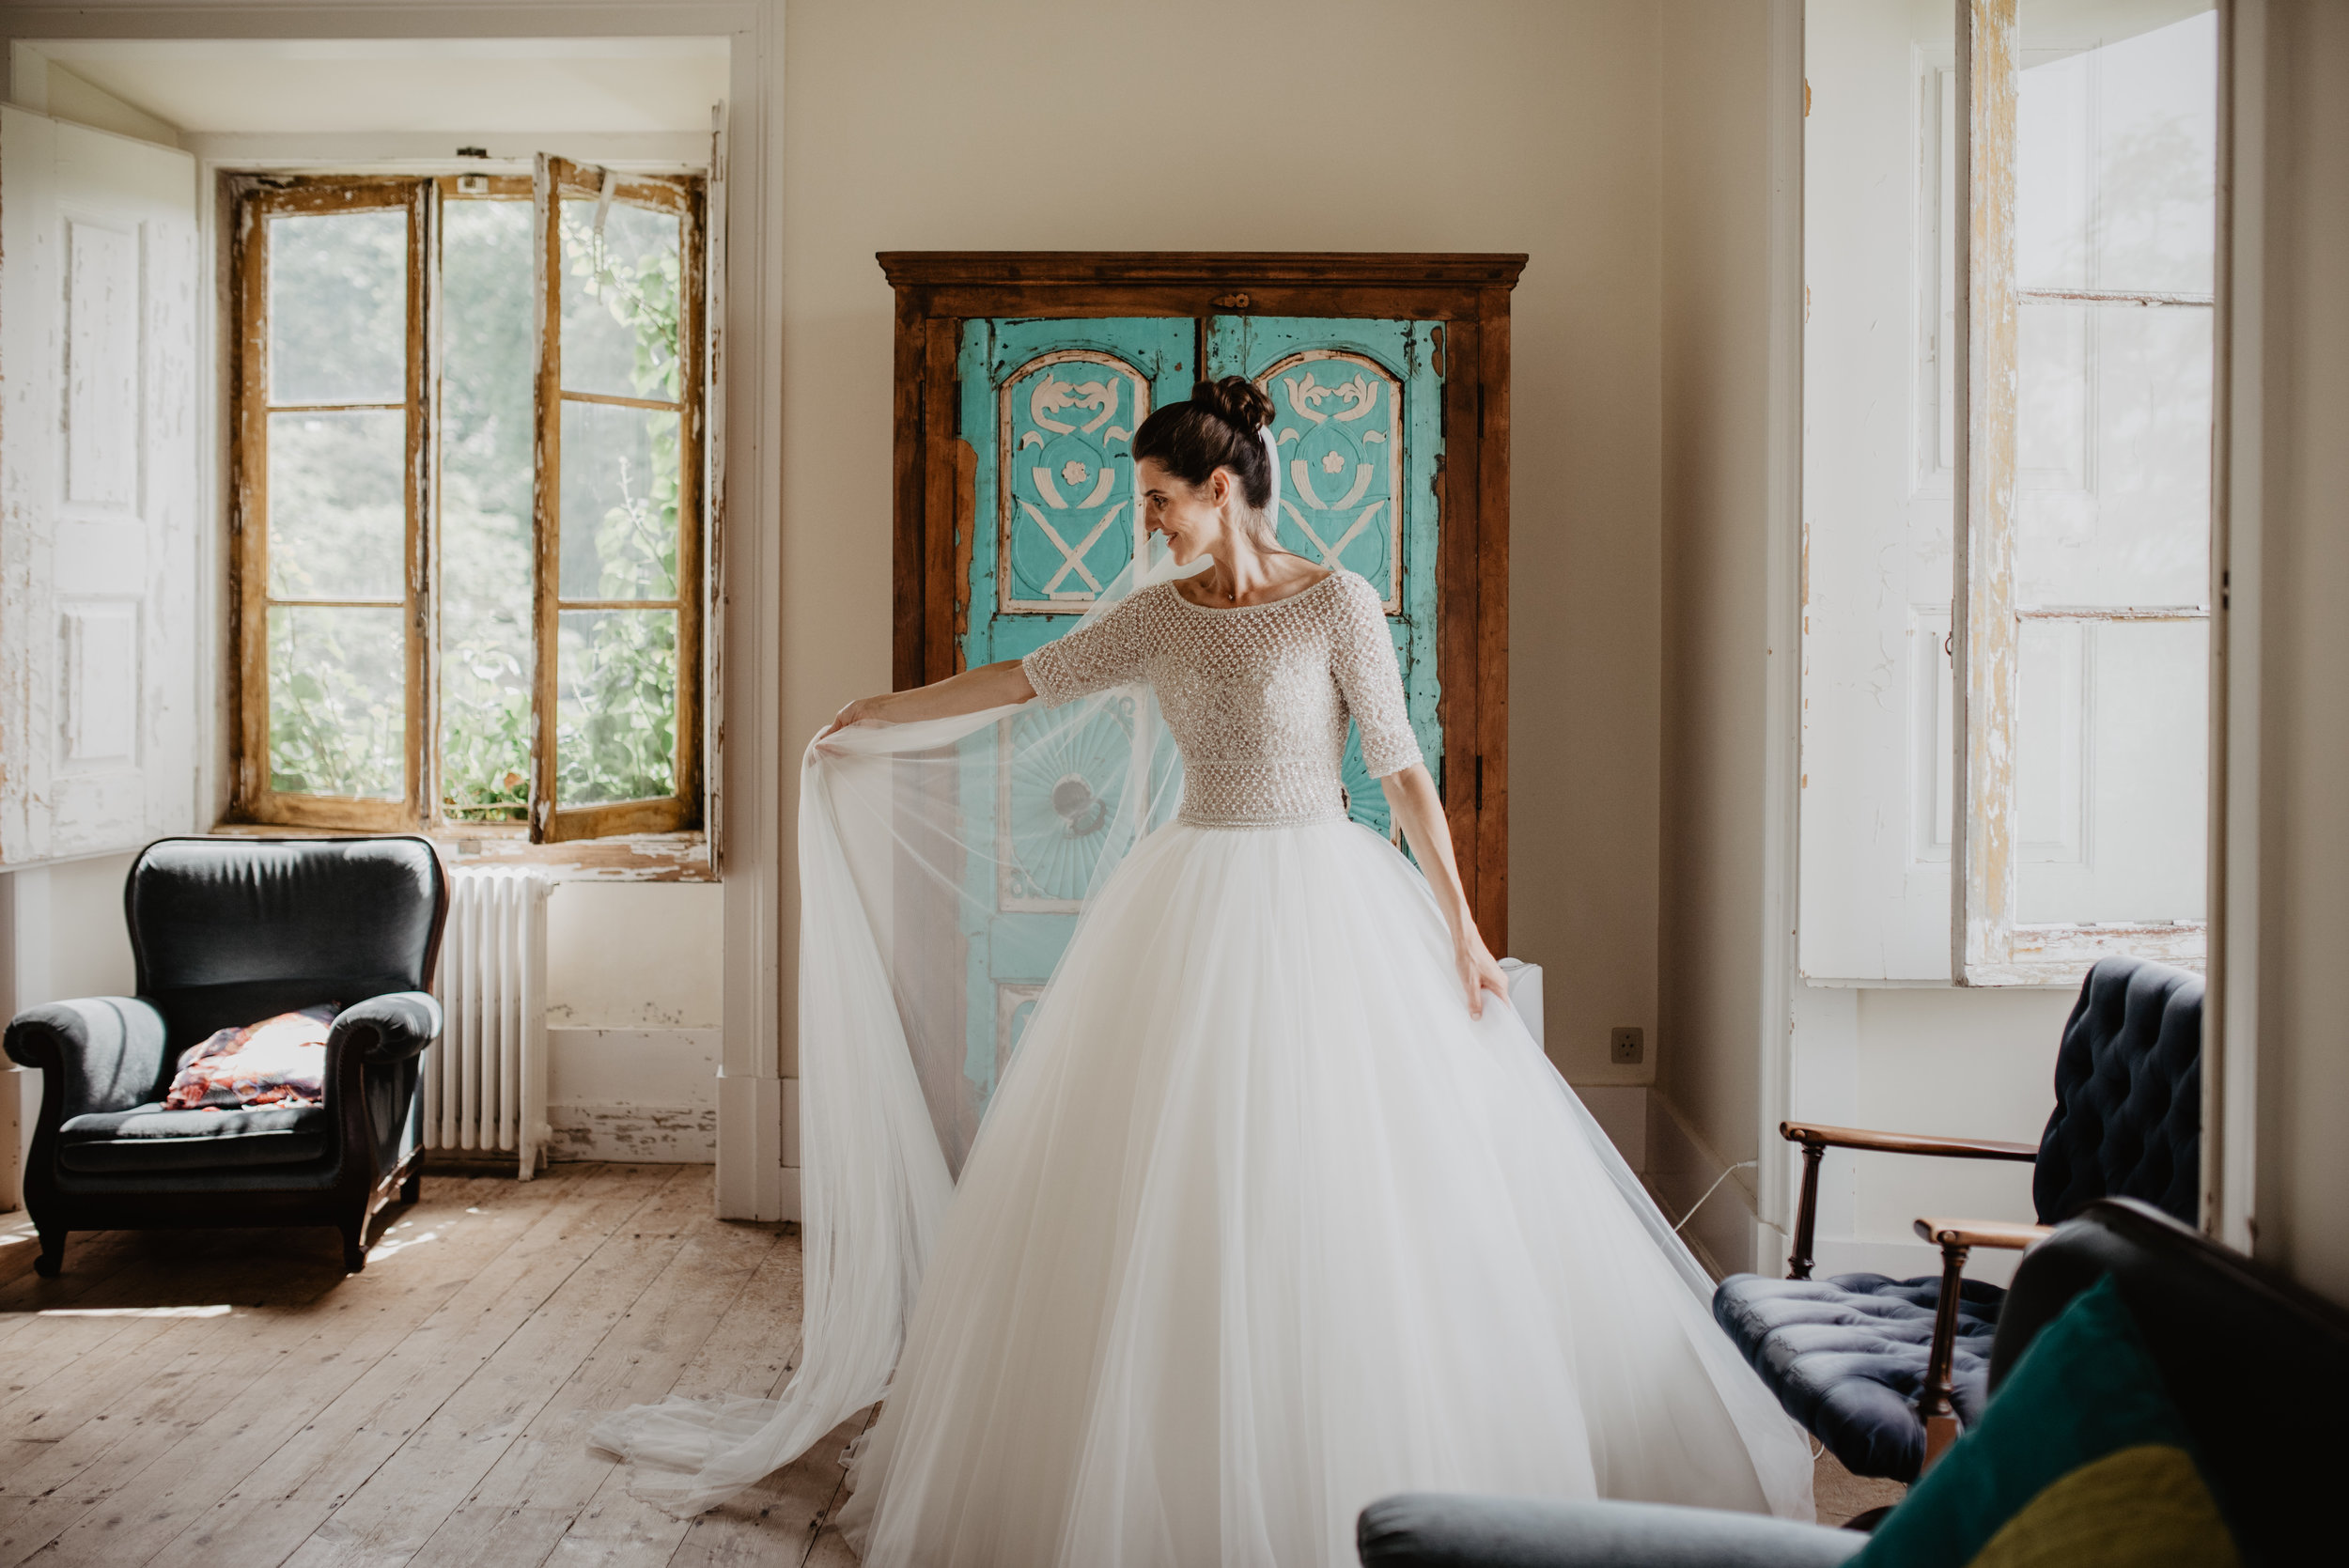 Lapela-photography-wedding-sintra-portugal-45.jpg